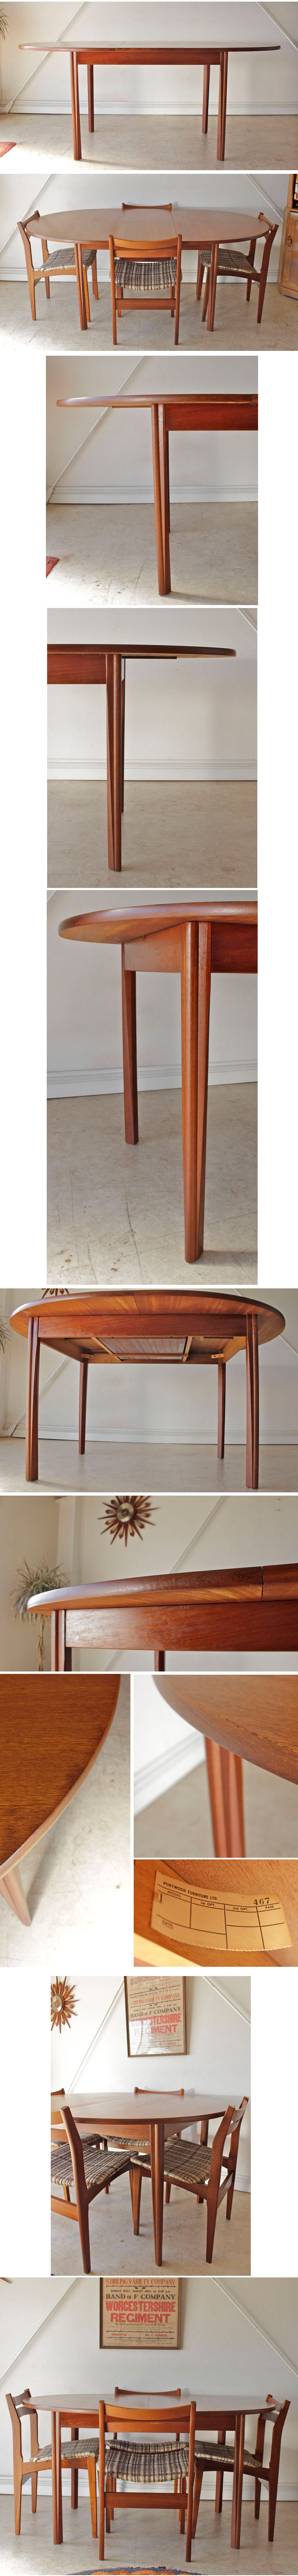 Portwood furniture ポートウッドファニチャー・伸張式ダイニングテーブル5点セット・椅子・イギリス北欧ビンテージ家具014017